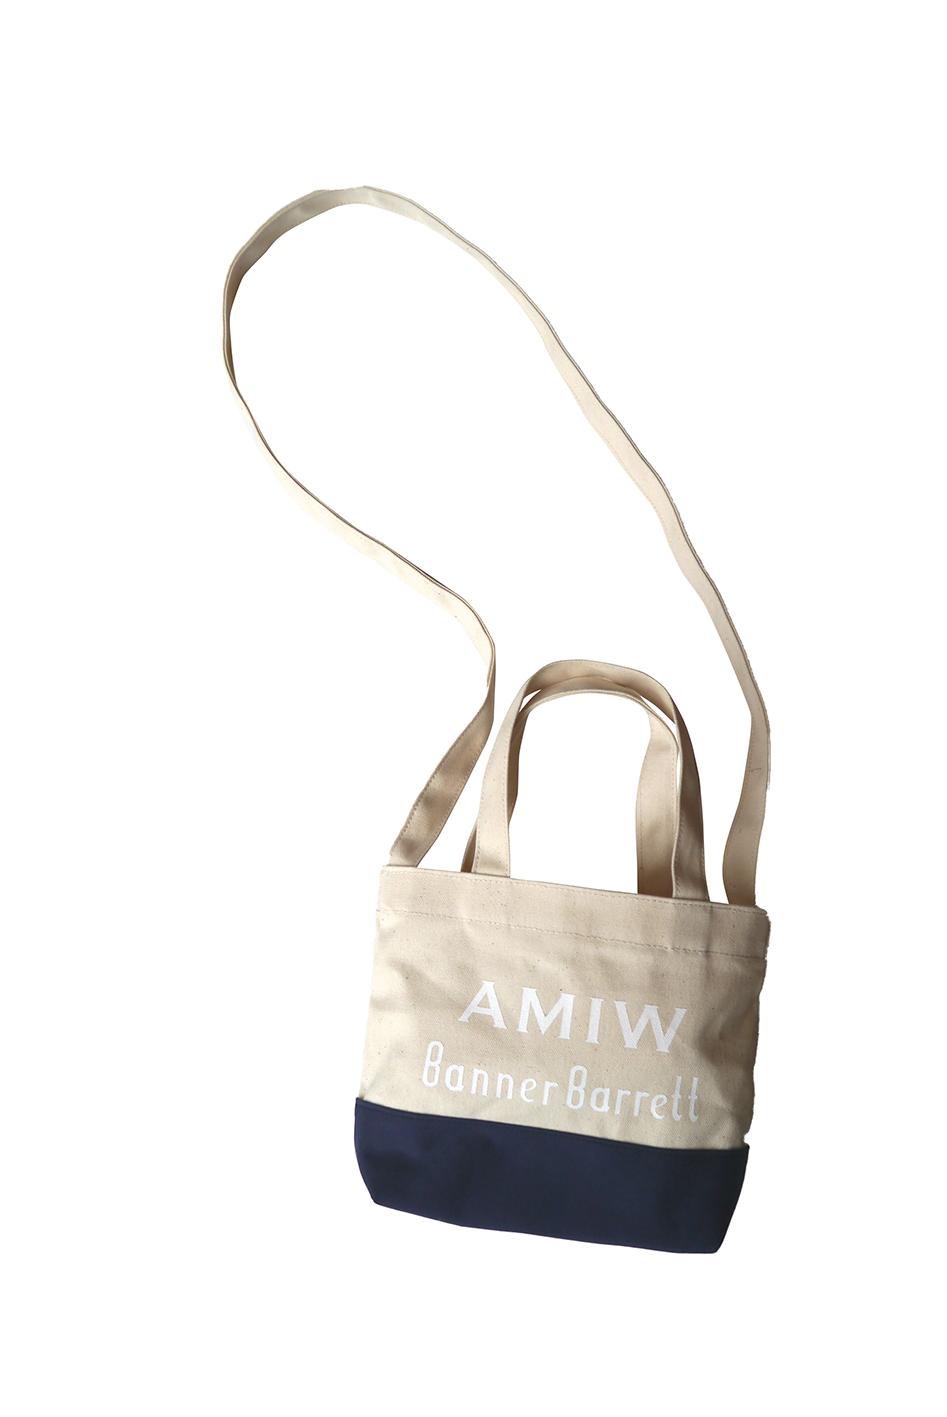 AMIWとBanner Barrettの旗艦店が祝♡1周年! リミテッドアイテムがキュートすぎる♡_1